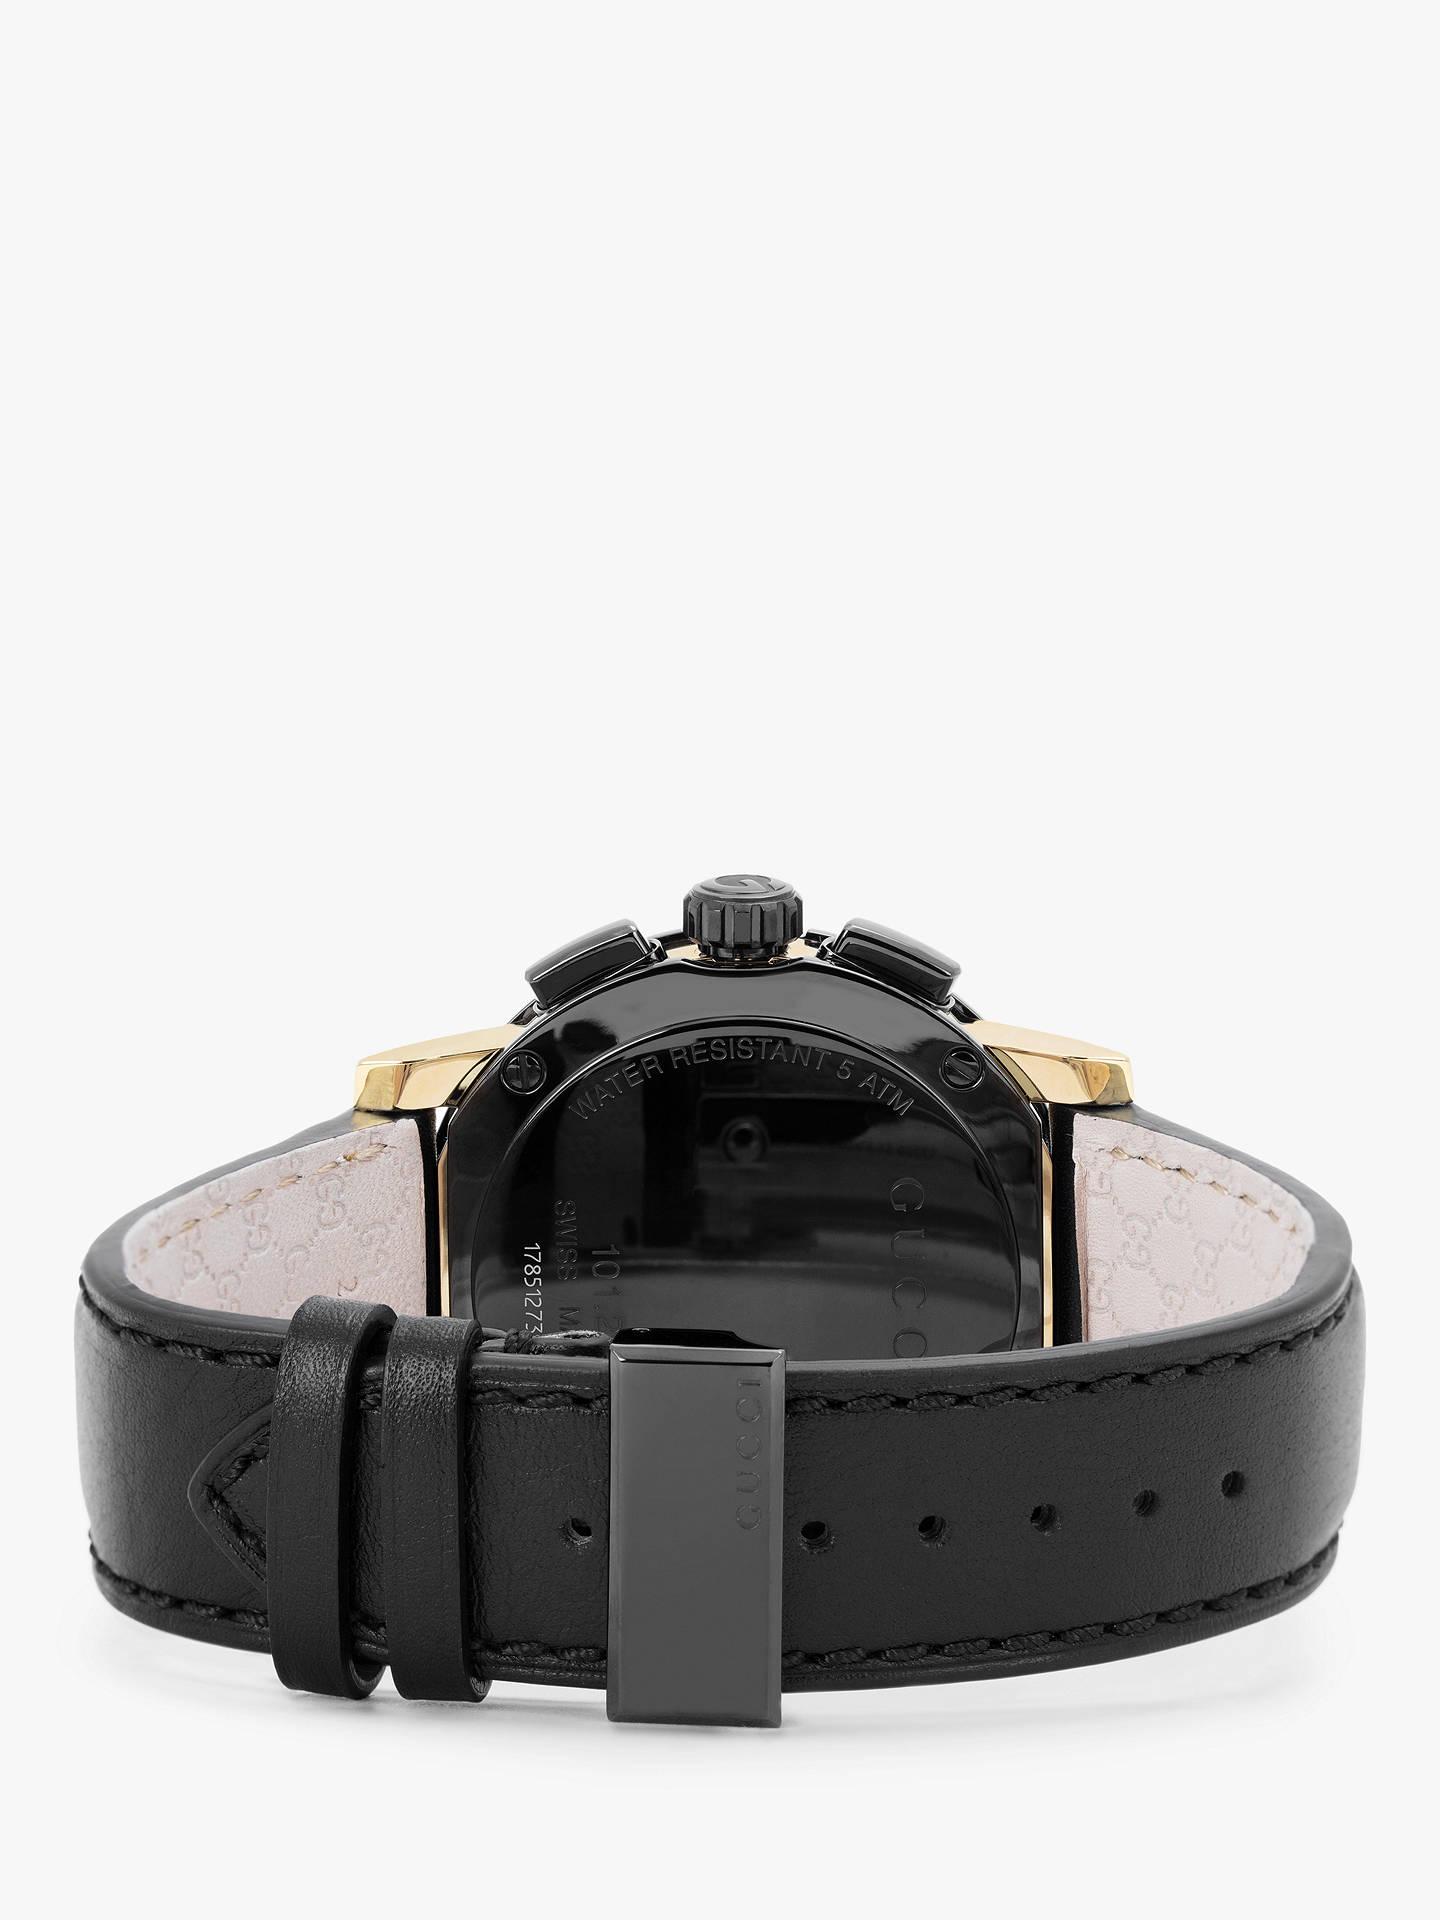 5b66357badf ... Buy Gucci YA101203 Men s G-Chrono Chronograph Leather Strap Watch